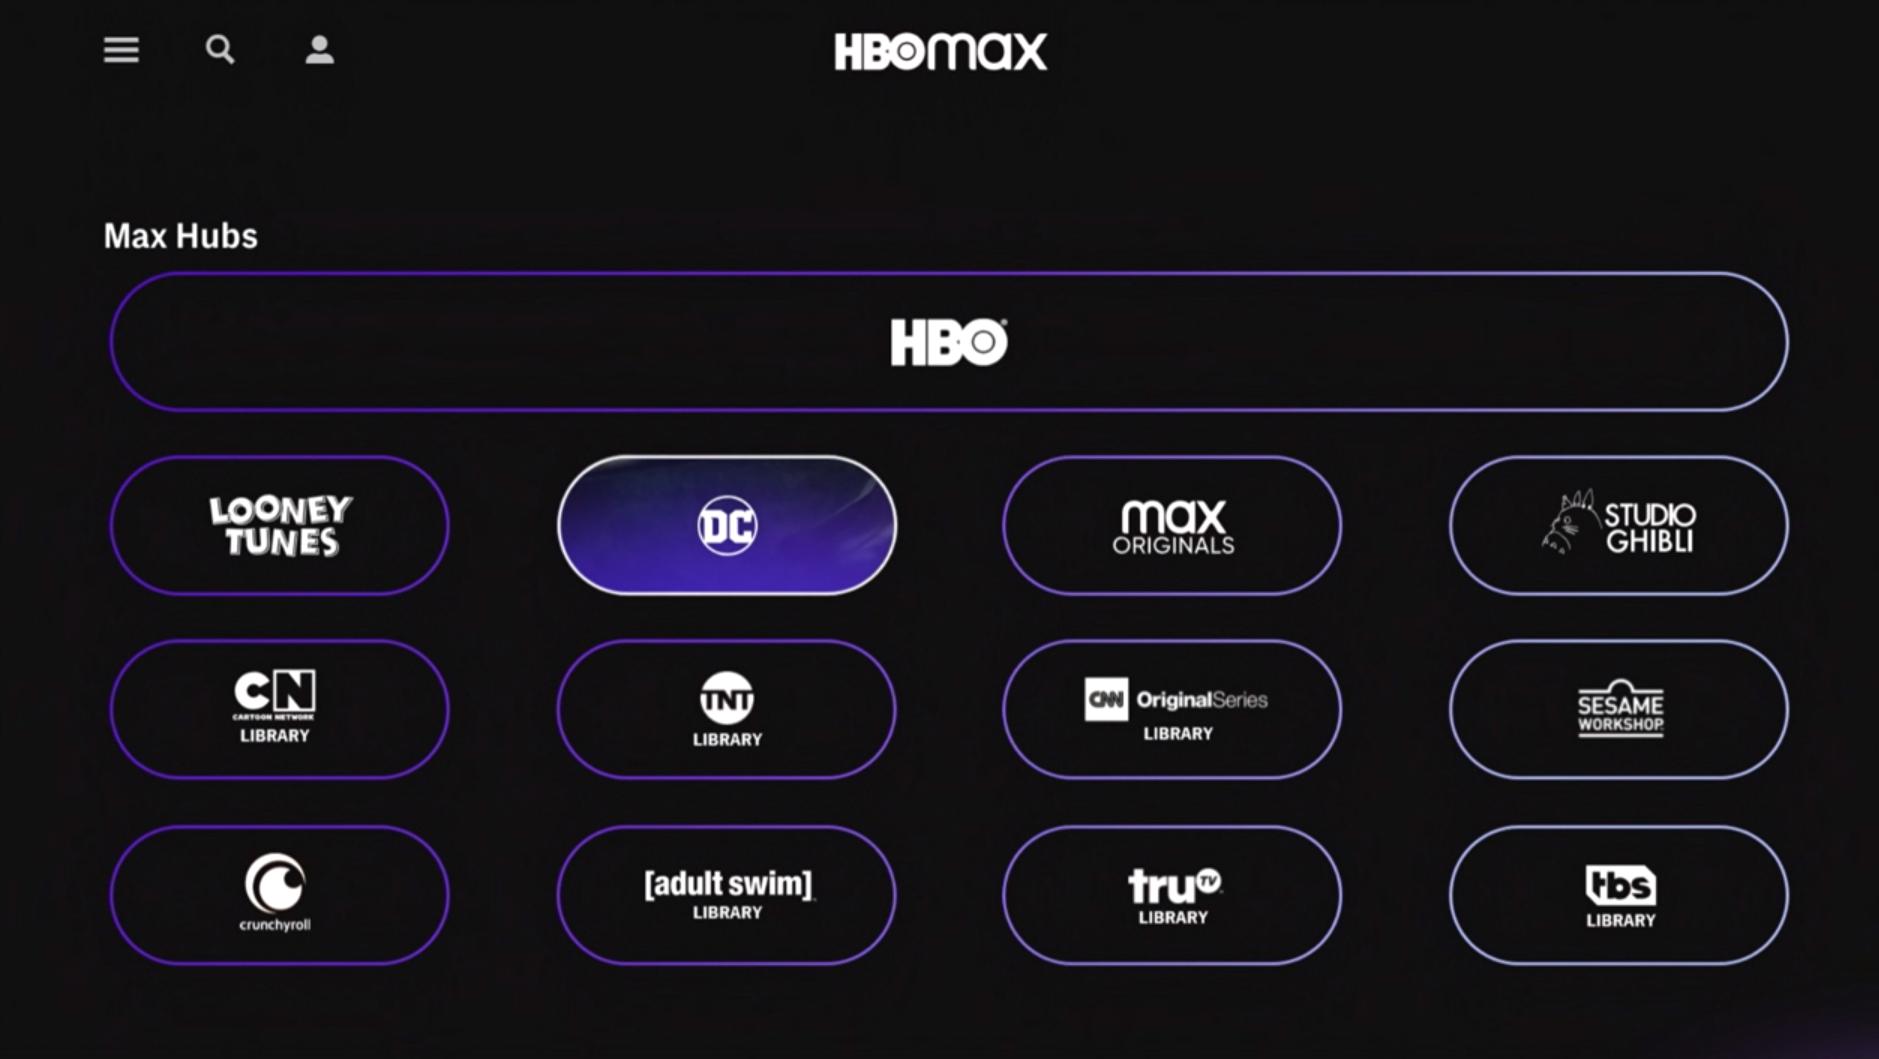 HBO Max hubs